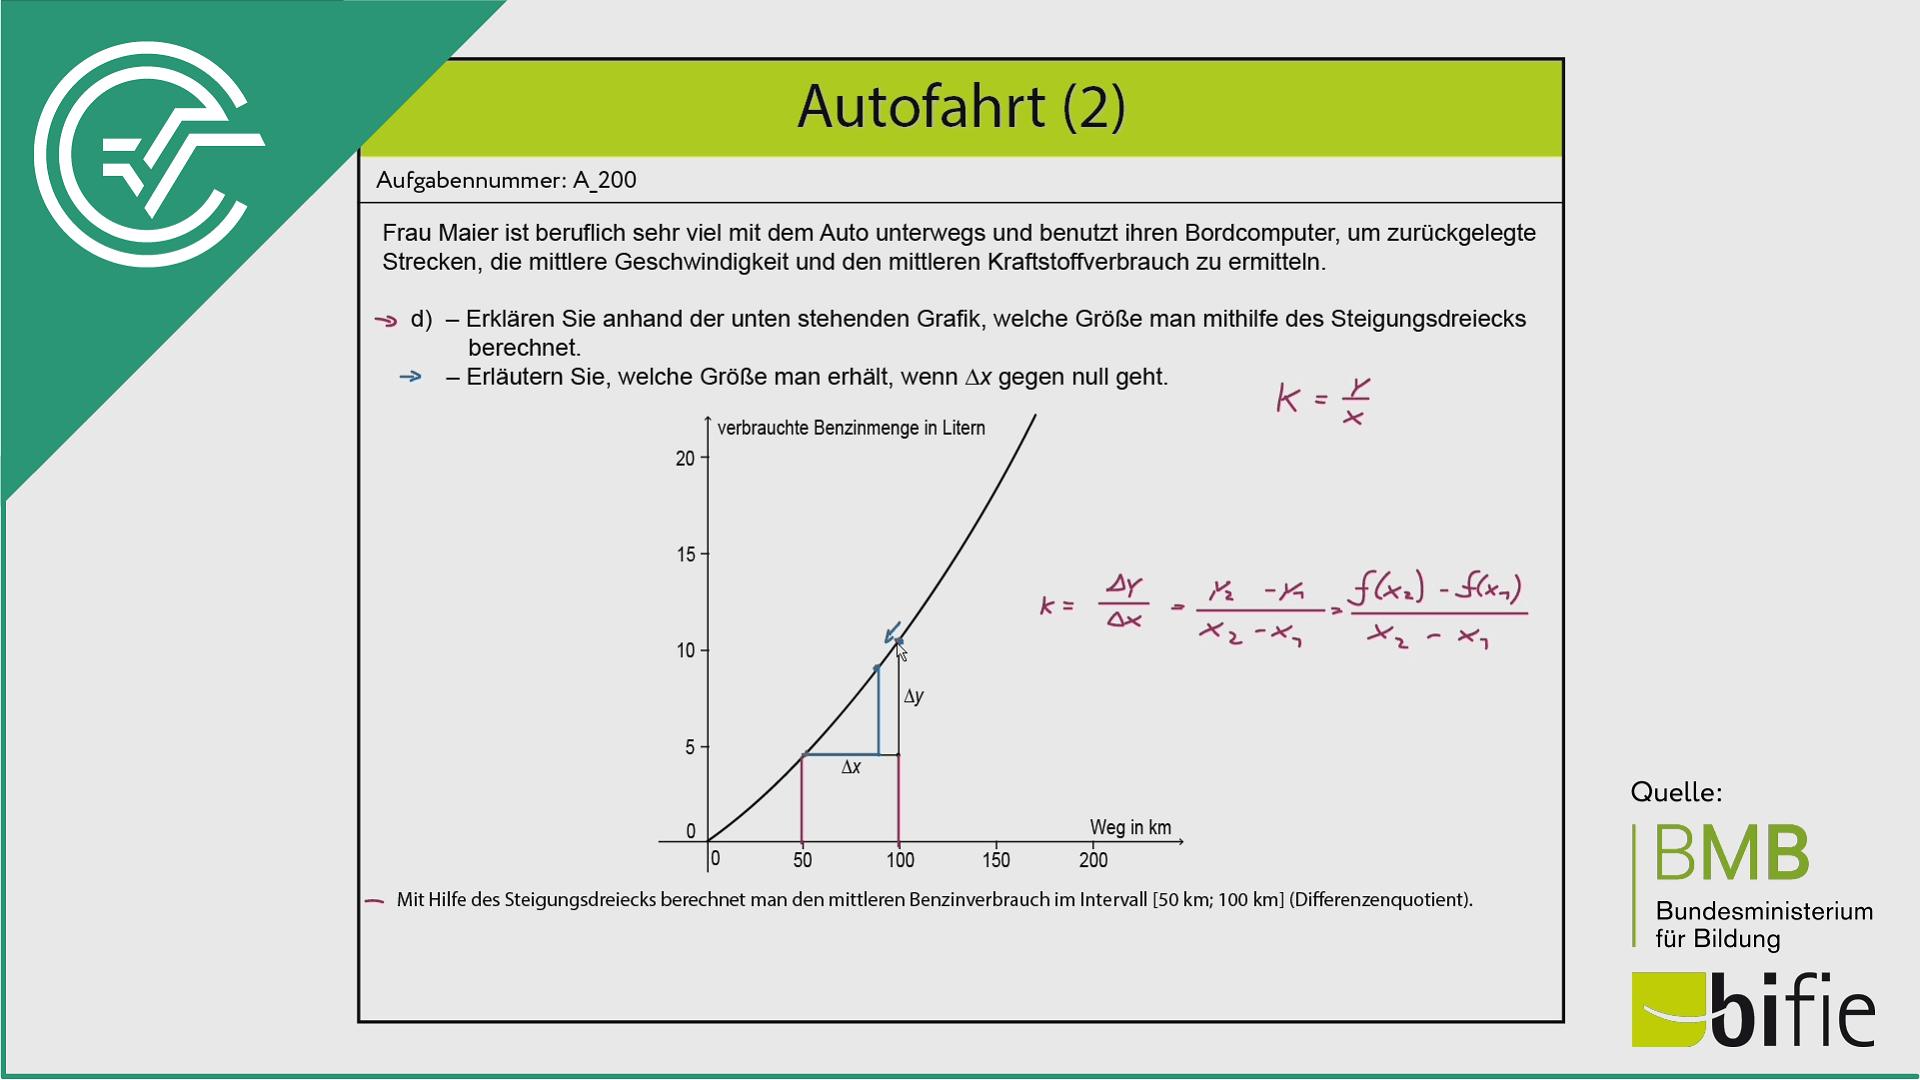 A_200 Autofahrt (2) d [Differenzen + Differentialquotient]